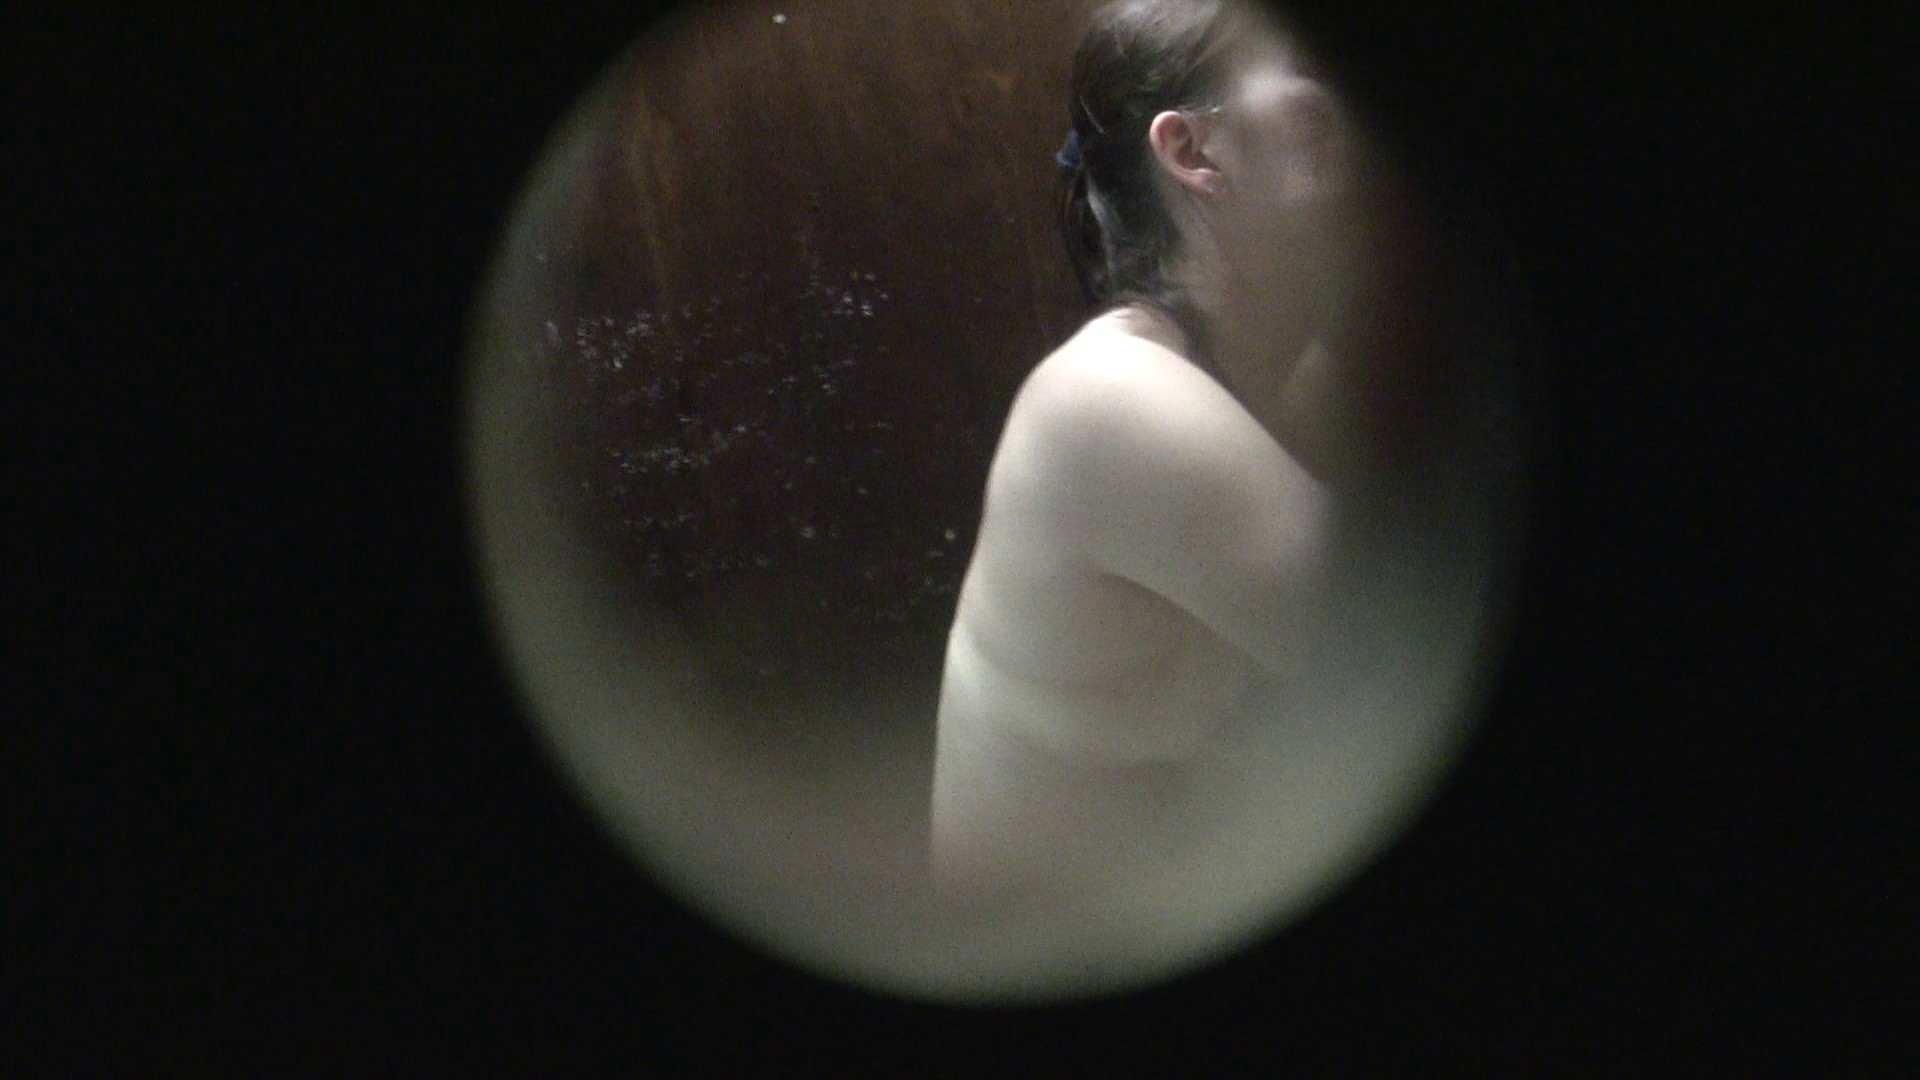 NO.01 胃下垂気味のへそピアスギャル 覗き  40Pix 33